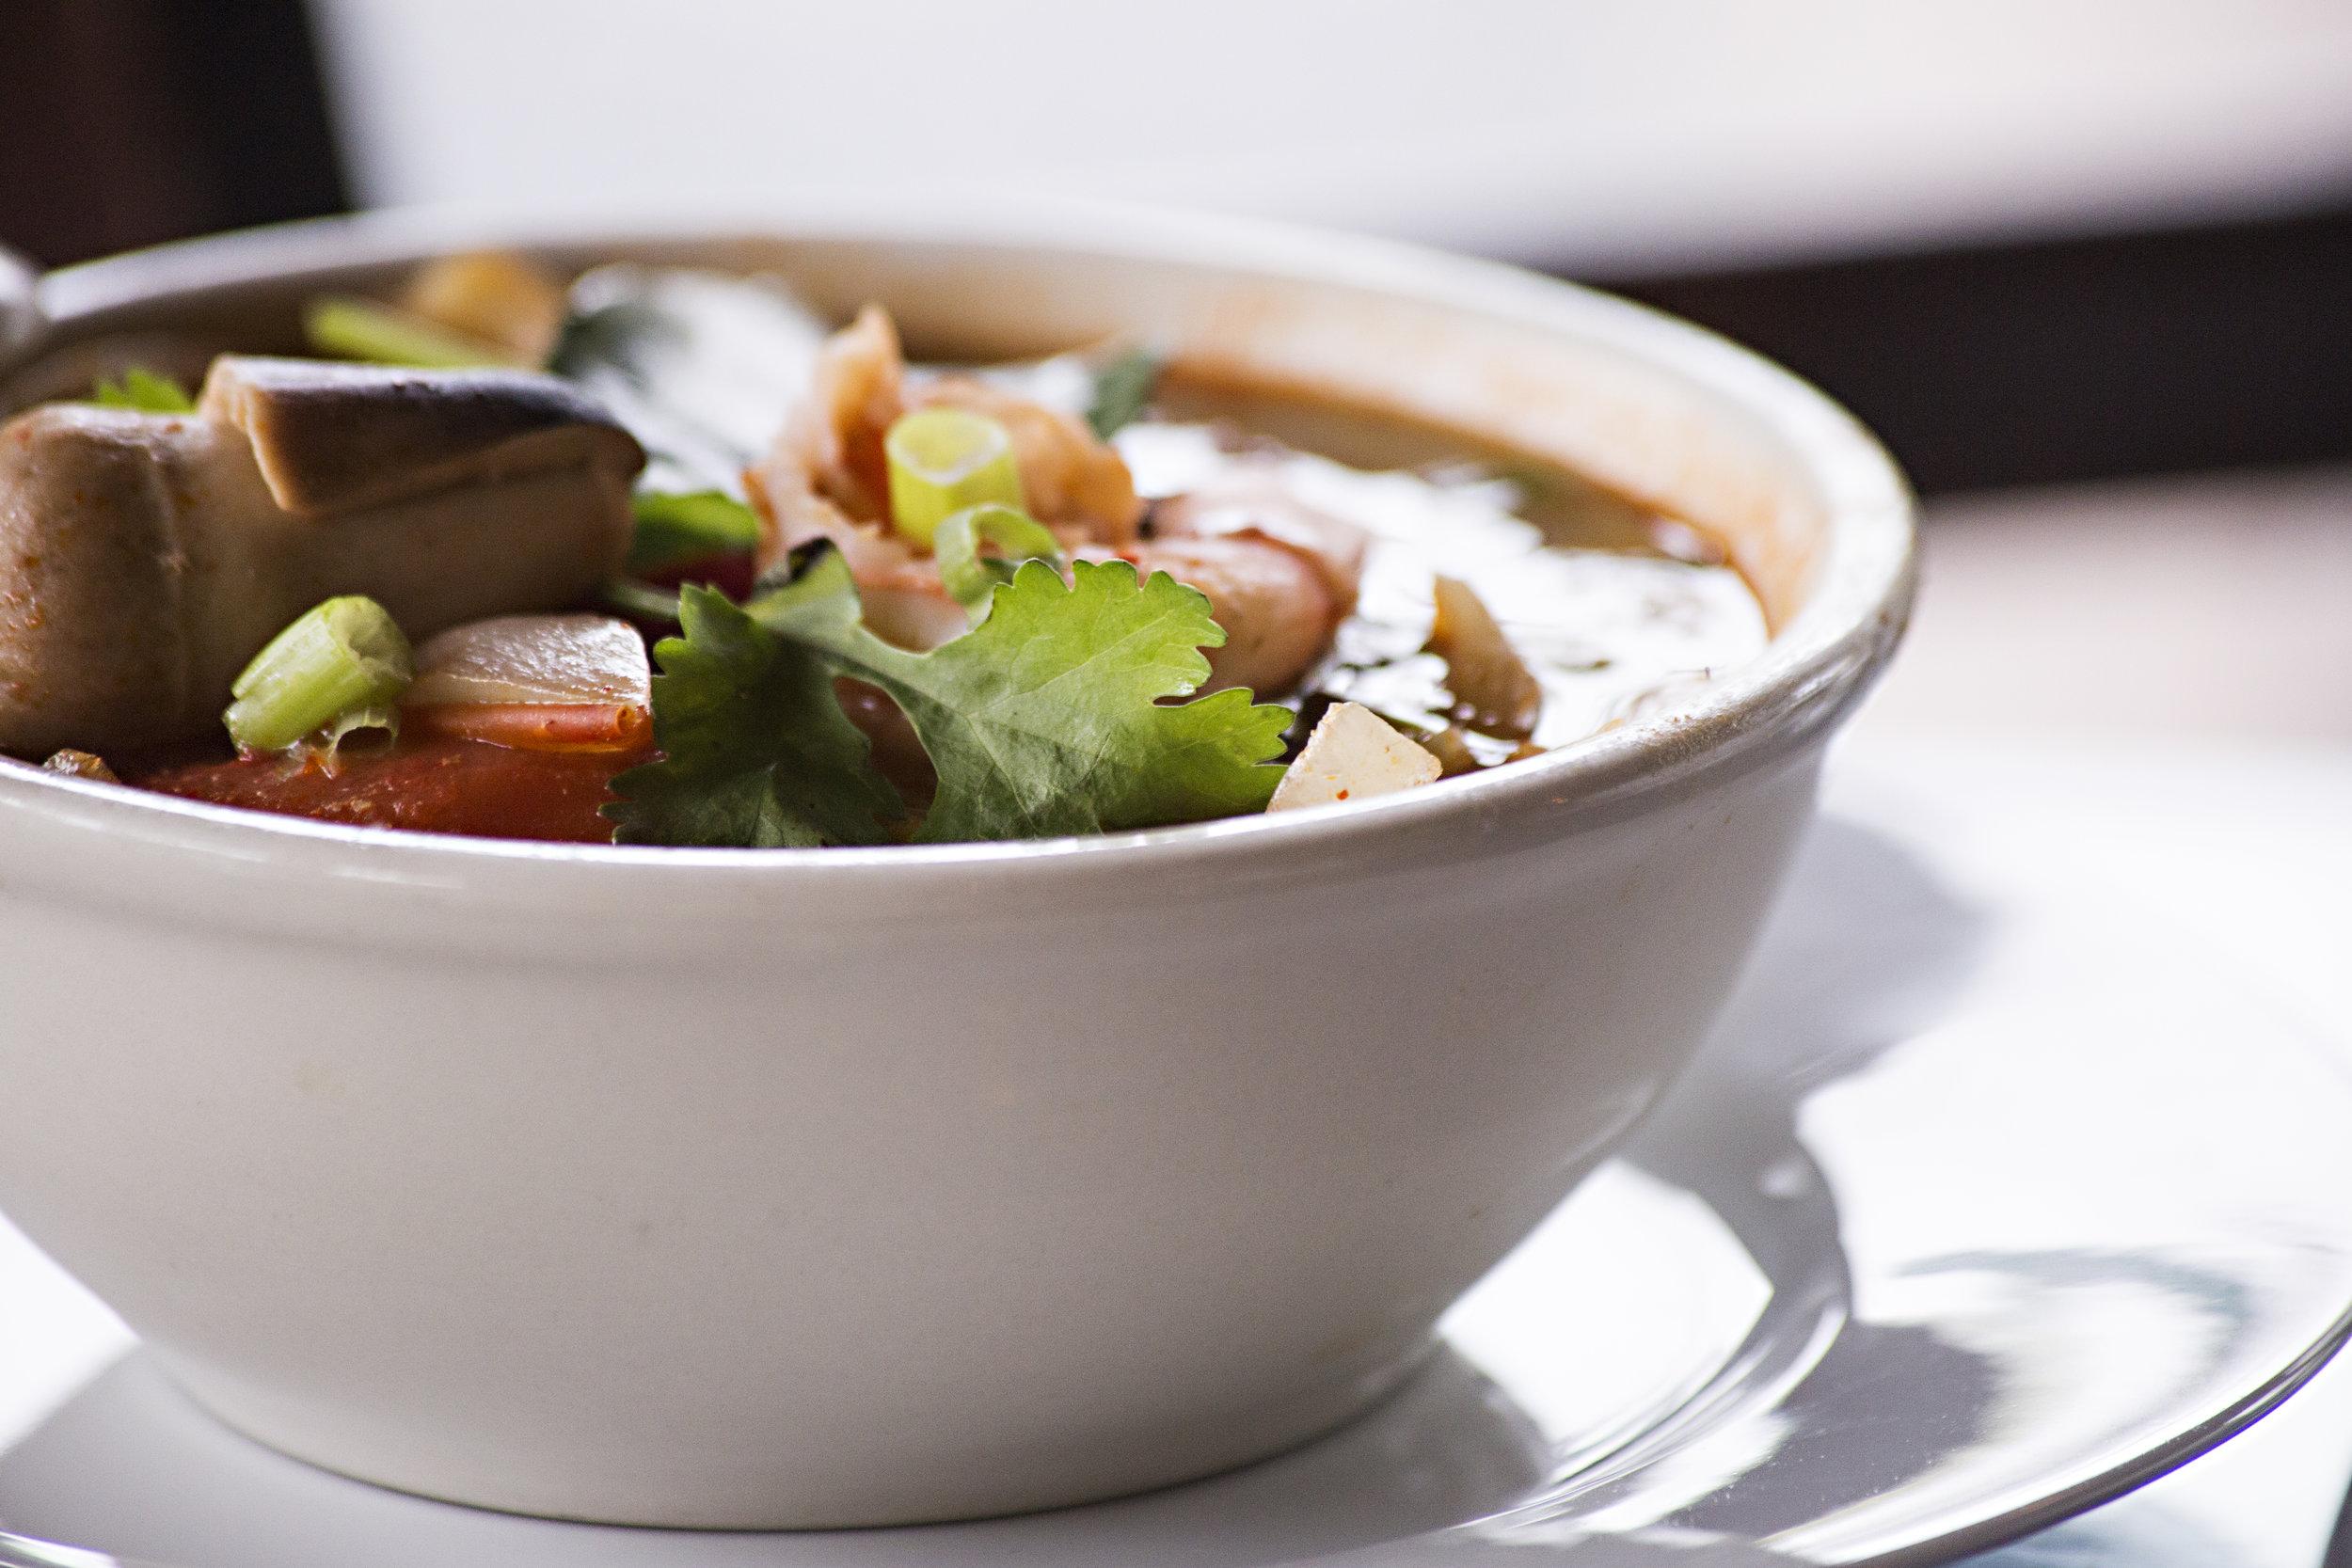 asian-restaurant-bradley-beach-nj-christine-mendoza-naked-video